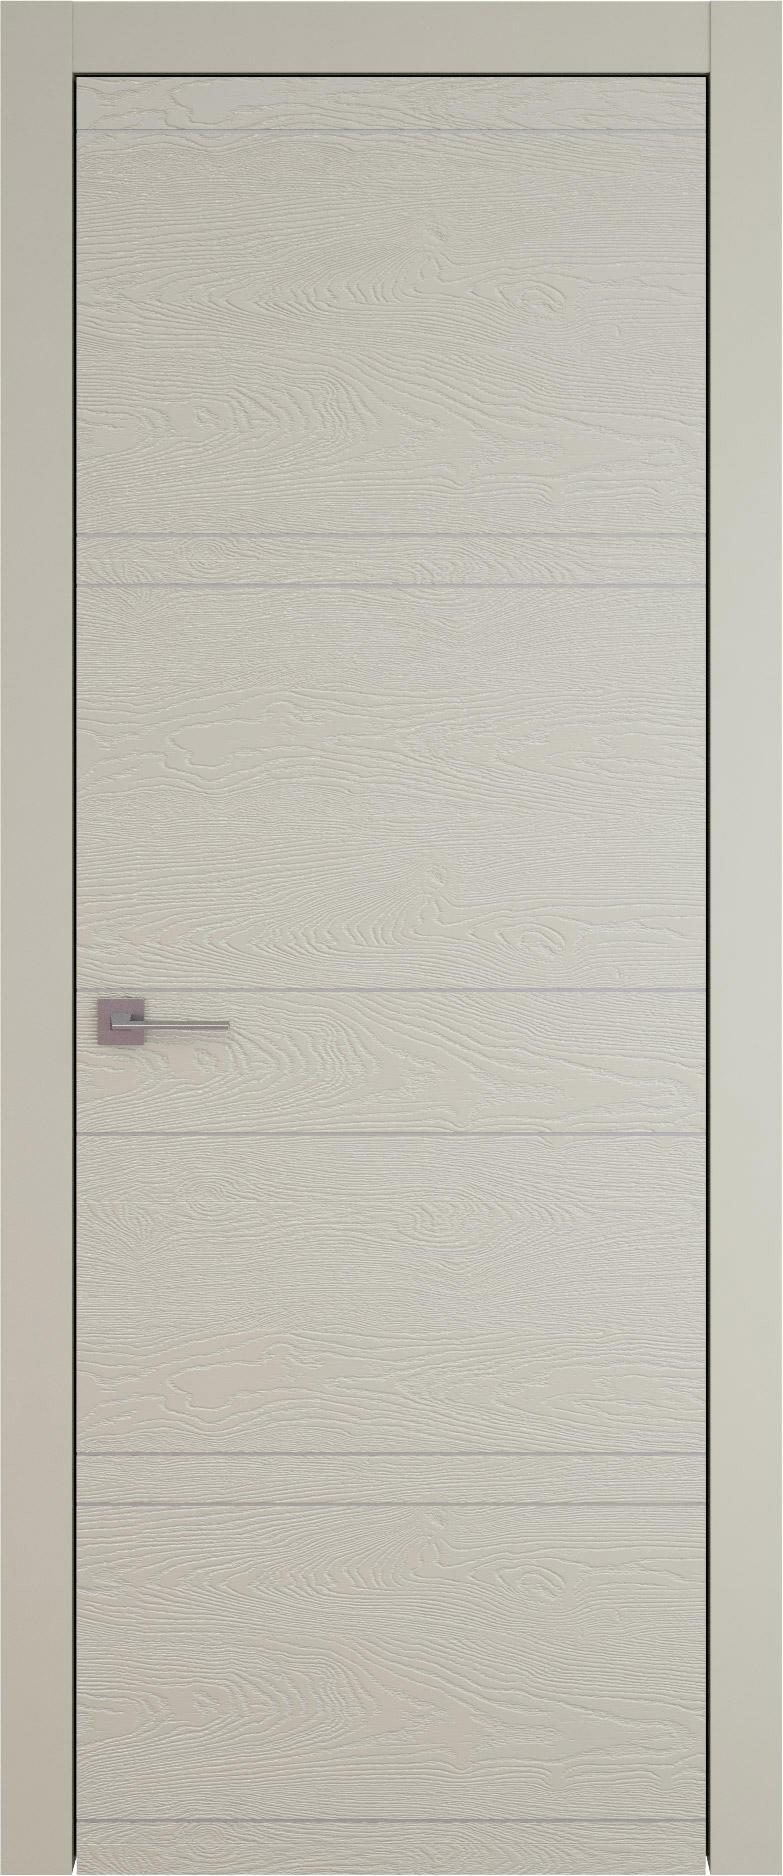 Tivoli Е-2 цвет - Серо-оливковая эмаль по шпону (RAL 7032) Без стекла (ДГ)